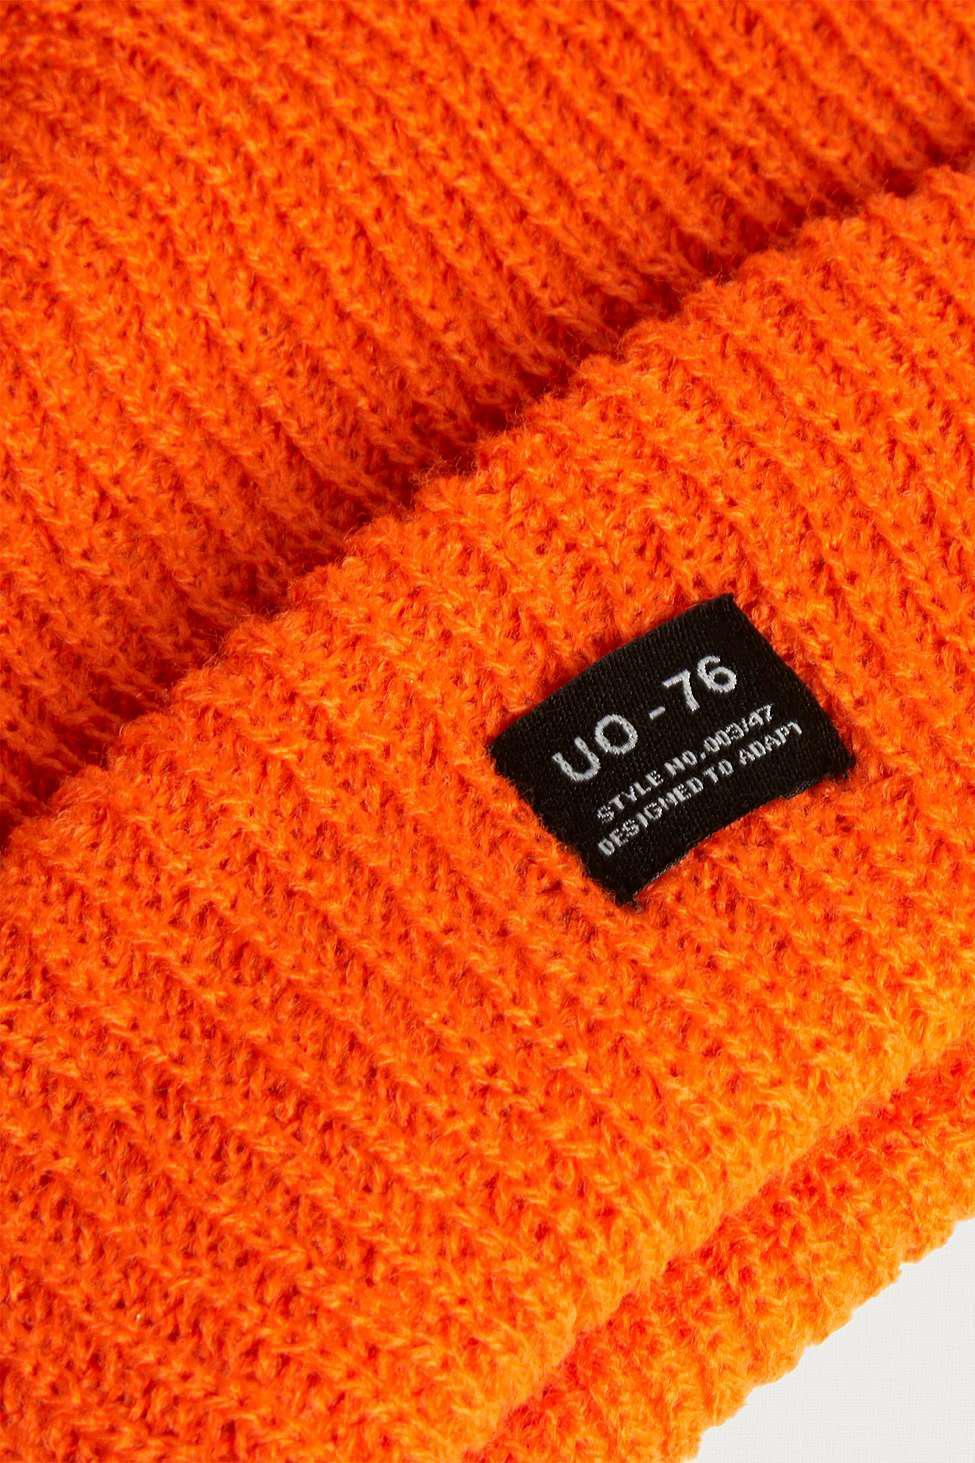 ac7b1fca579 Urban Outfitters Uo Orange Mini Roll Beanie - Mens All in Orange for ...